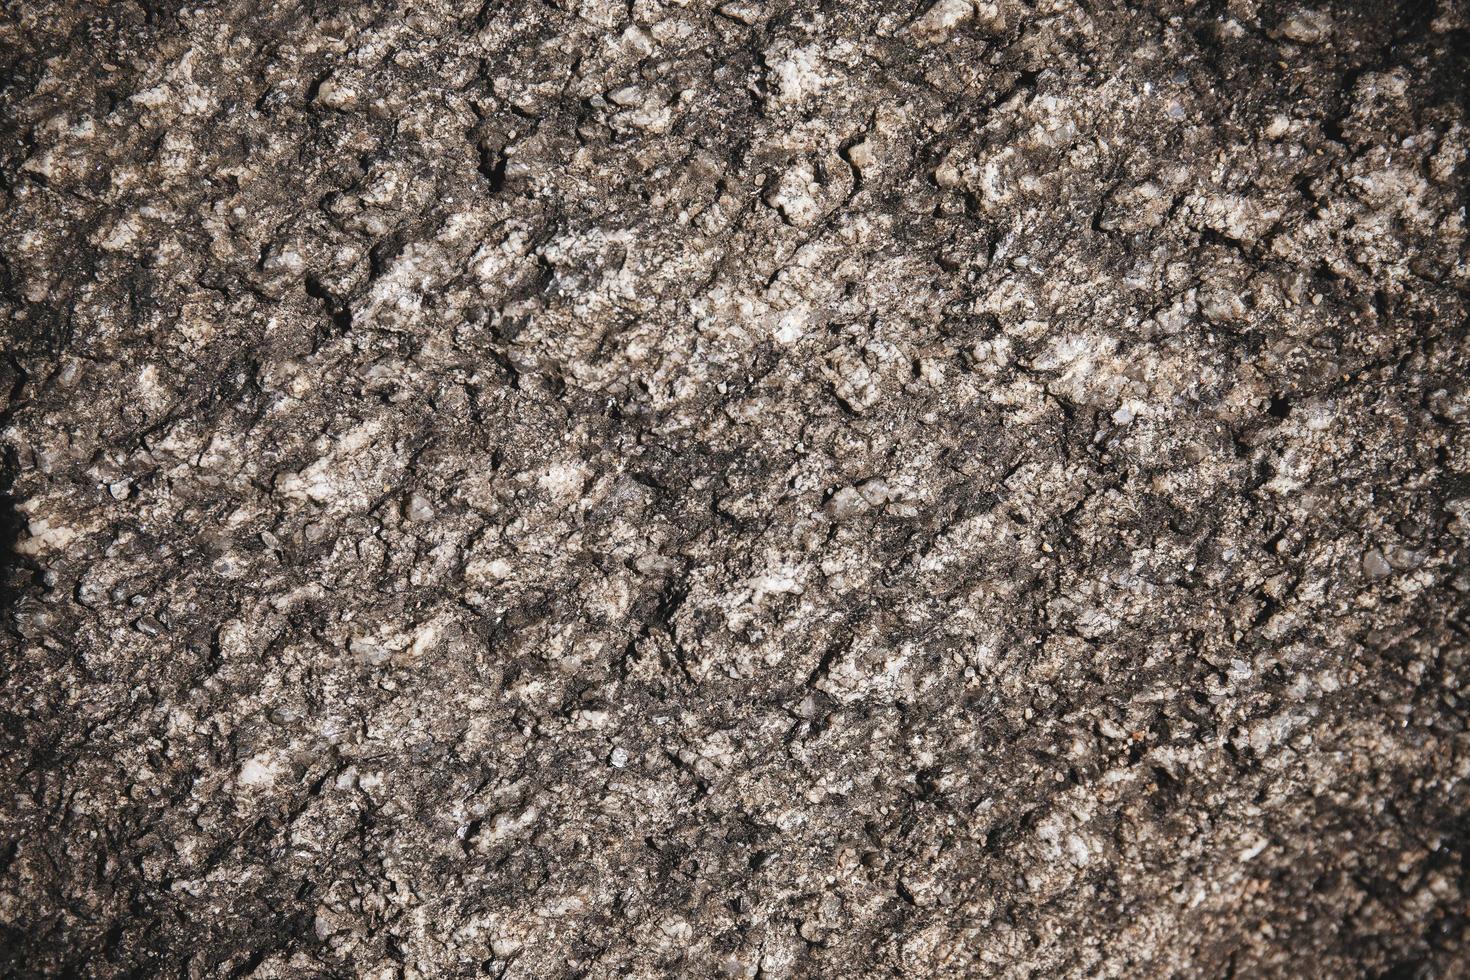 Corteza de árbol de textura rústica patrón natural abstracto antecedentes, primer plano foto